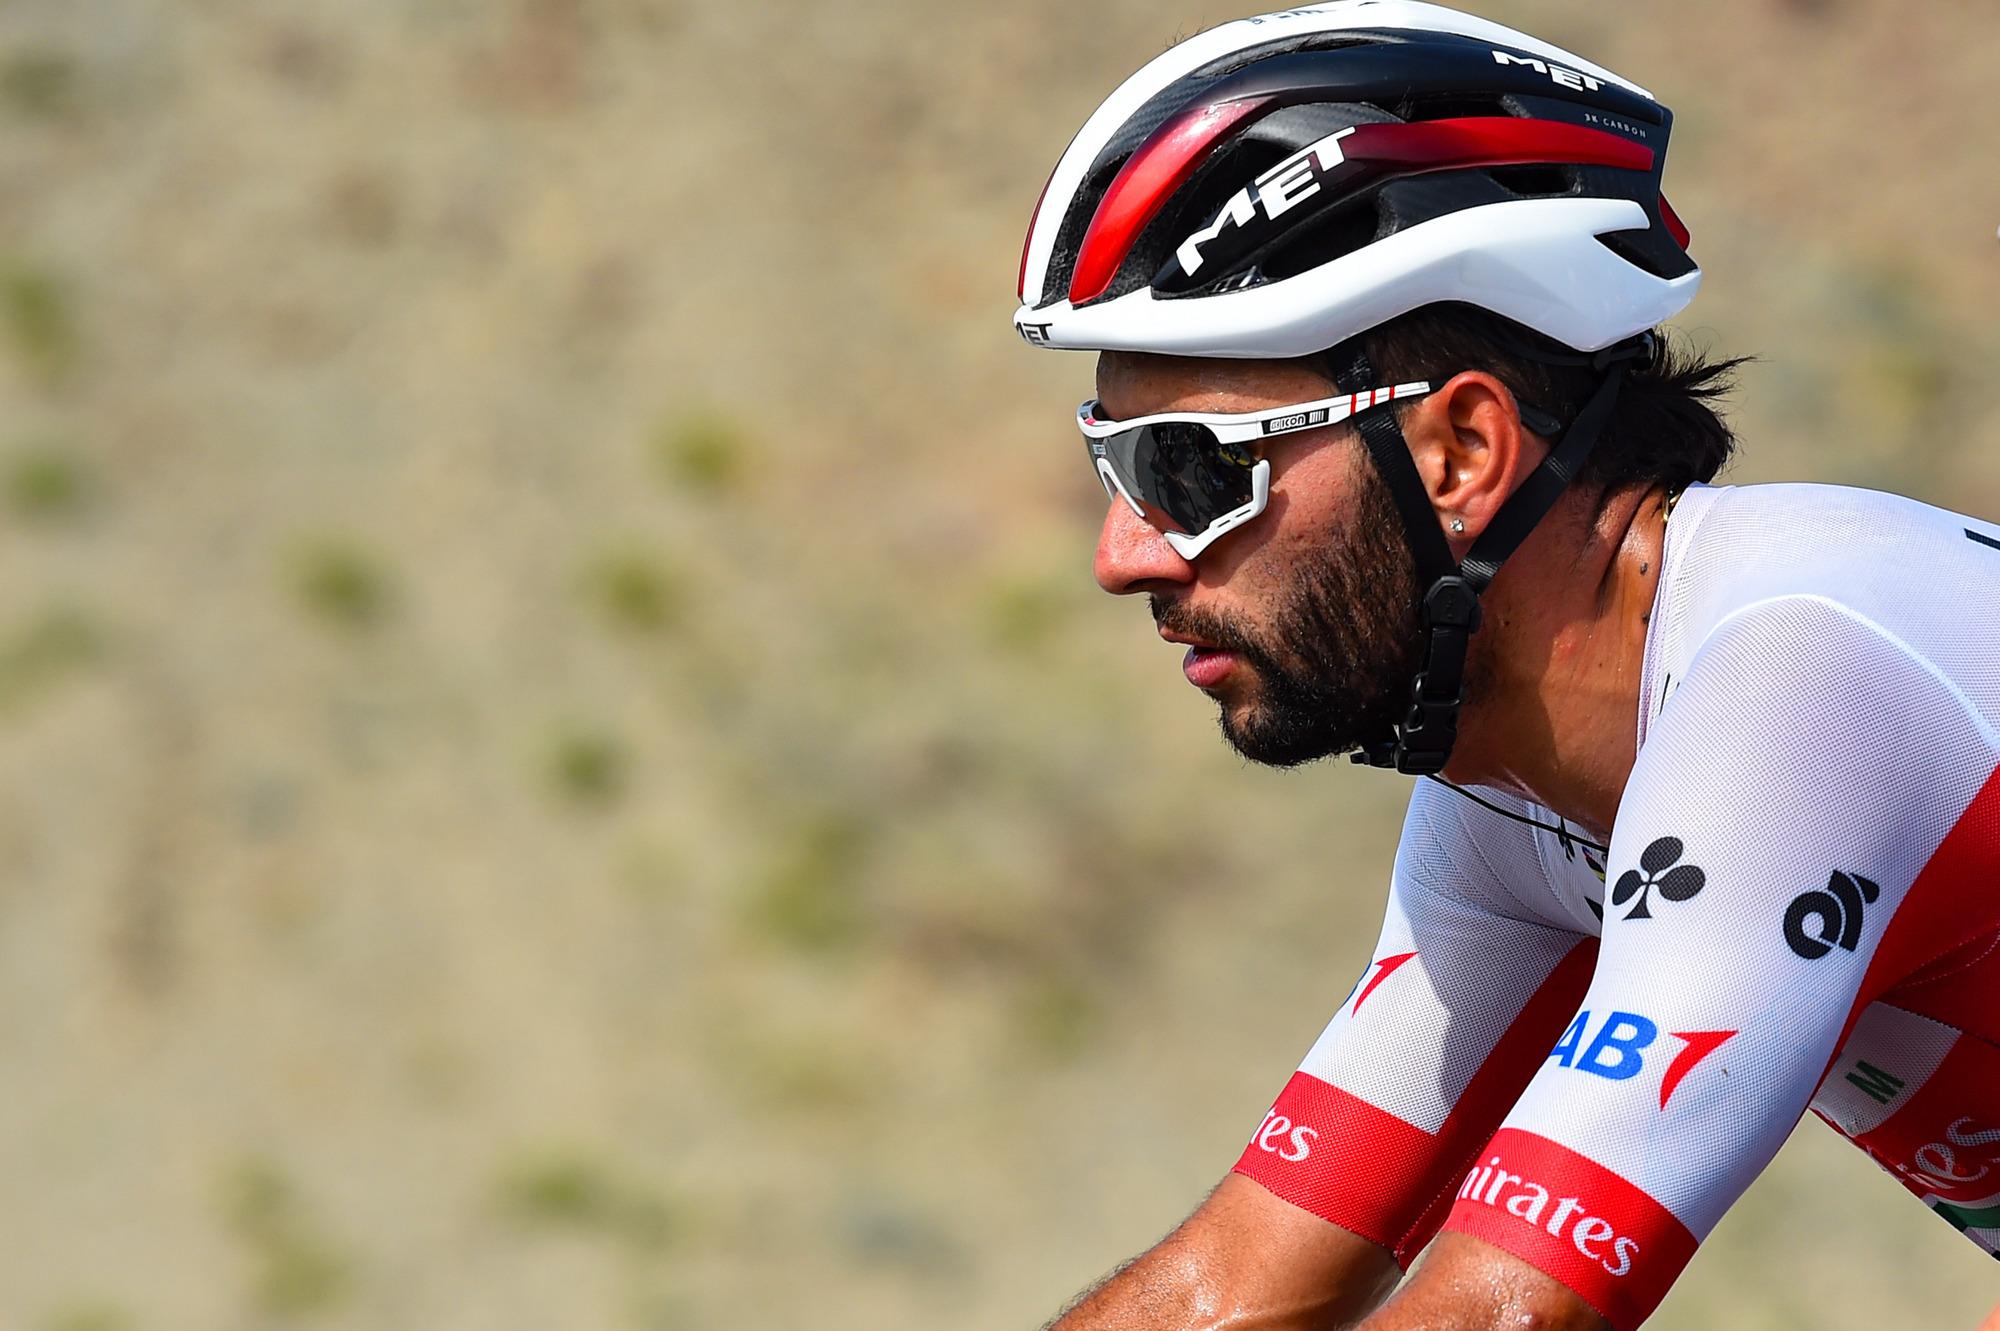 UAE Team Emirates' Fernando Gaviria on stage 2 of the 2020 UAE Tour